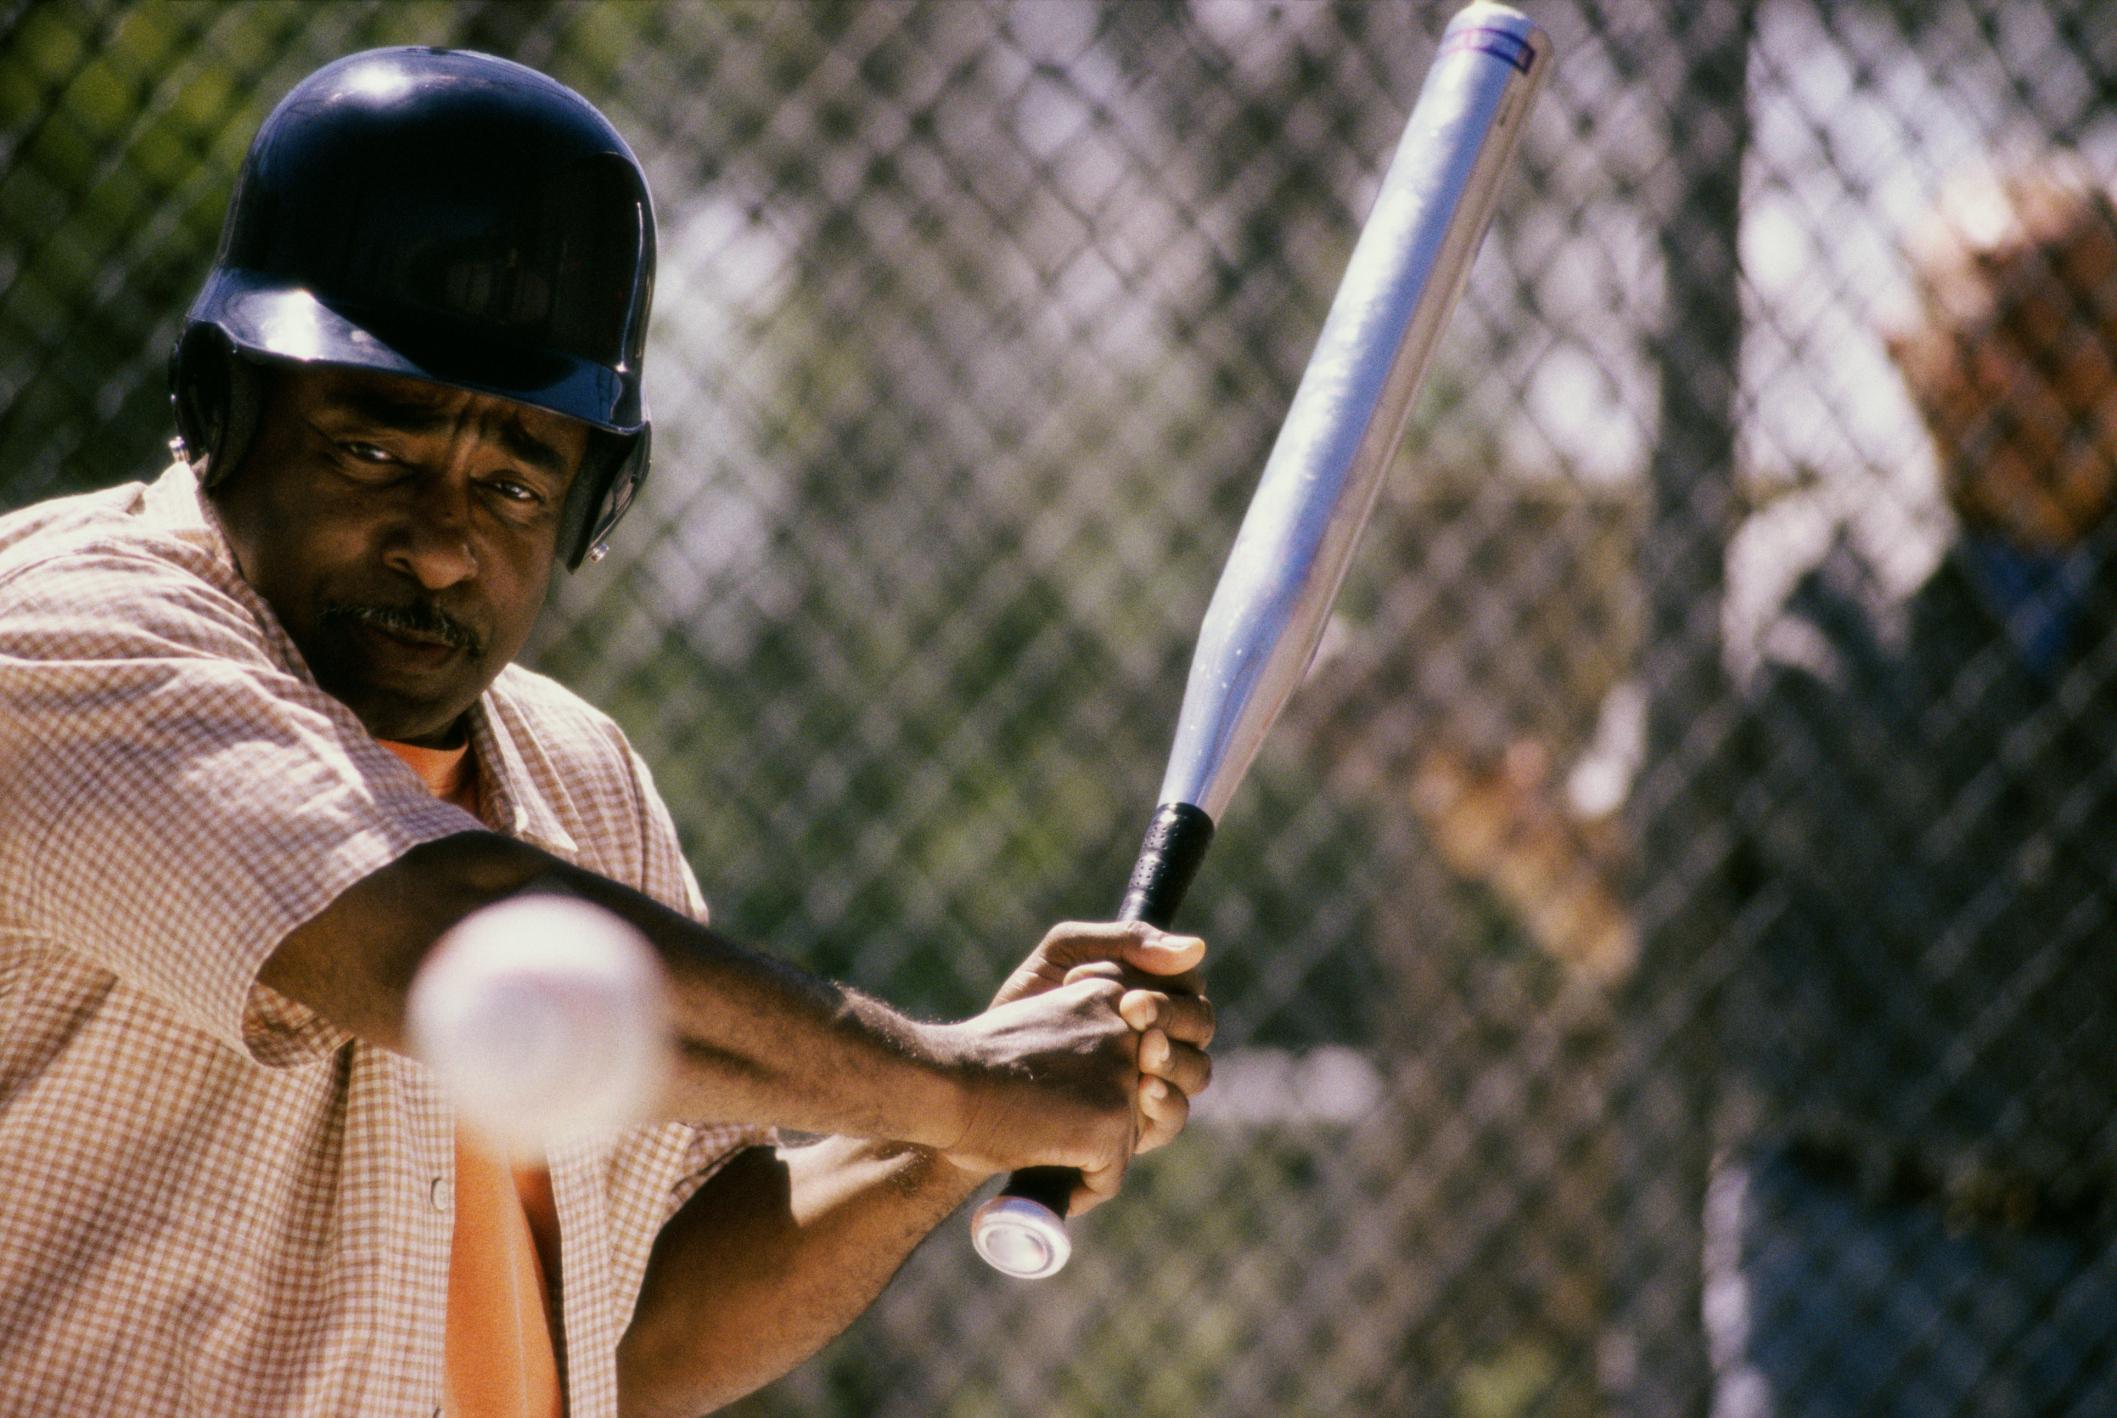 How to Juice Your Baseball or Softball Bat